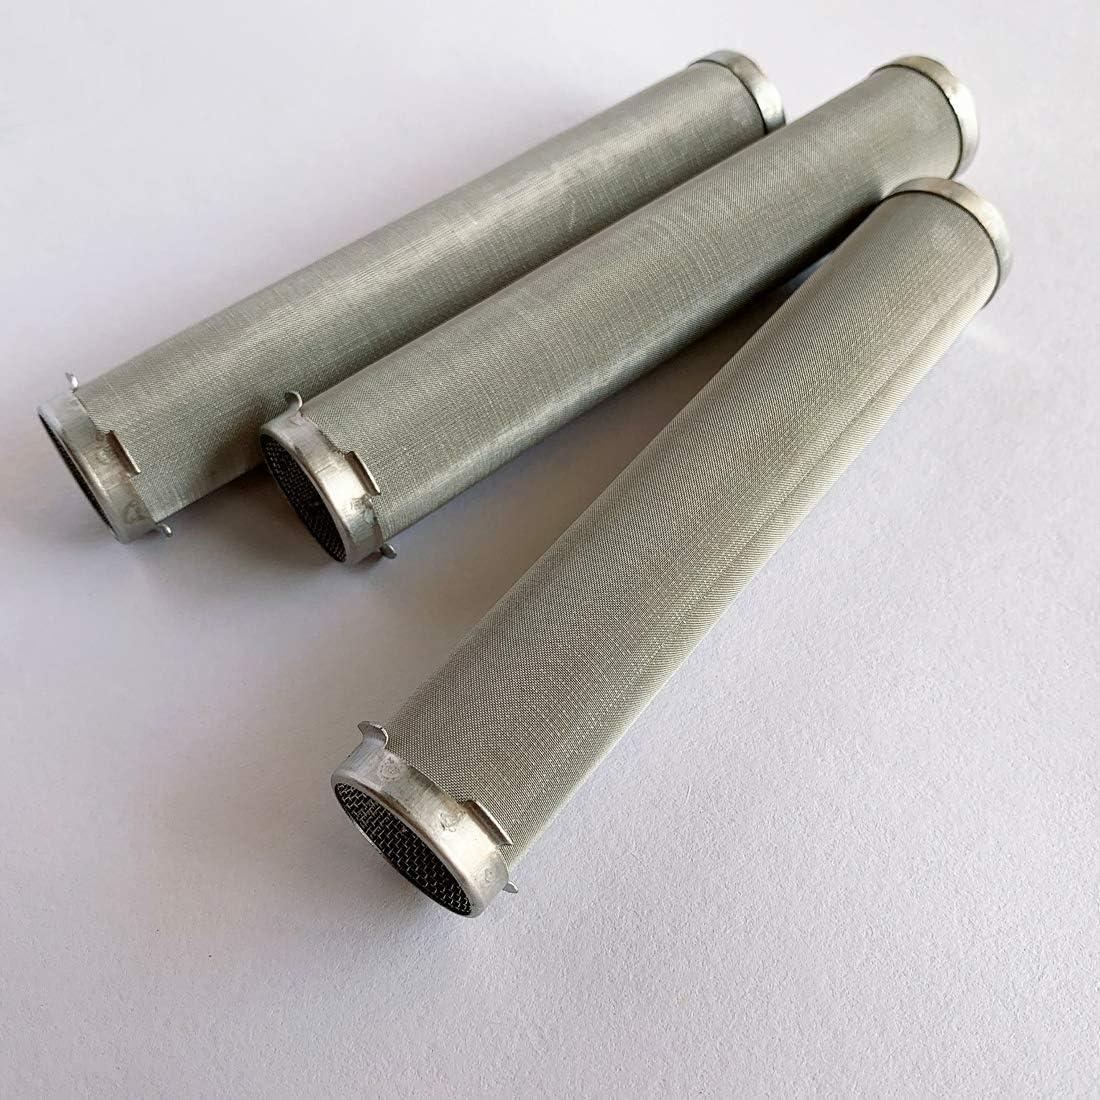 167025 or 167-025 Airless Paint Sprayer Manifold Fluid Filter 60 Mesh 3 Pieces